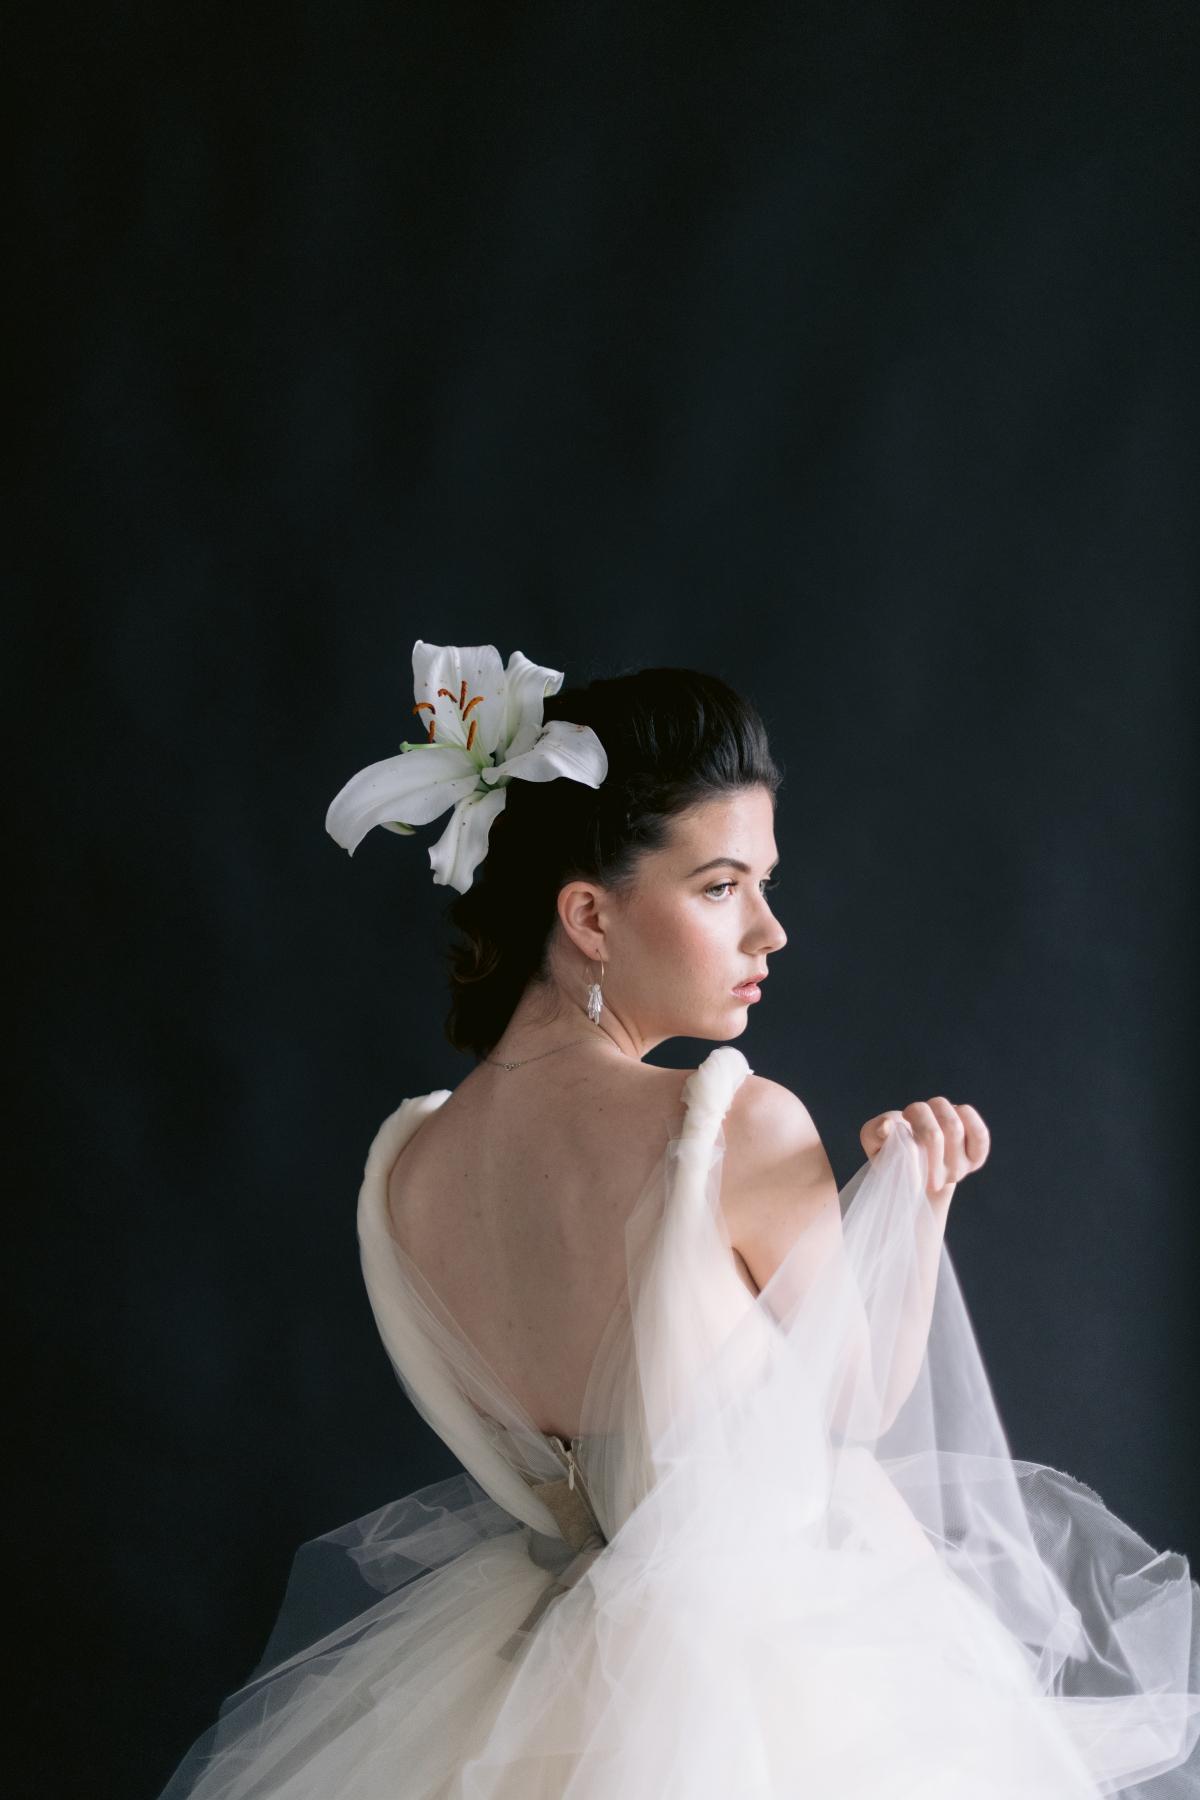 Laura Lanzerotte Bridal Danielle Heinson Photography 84